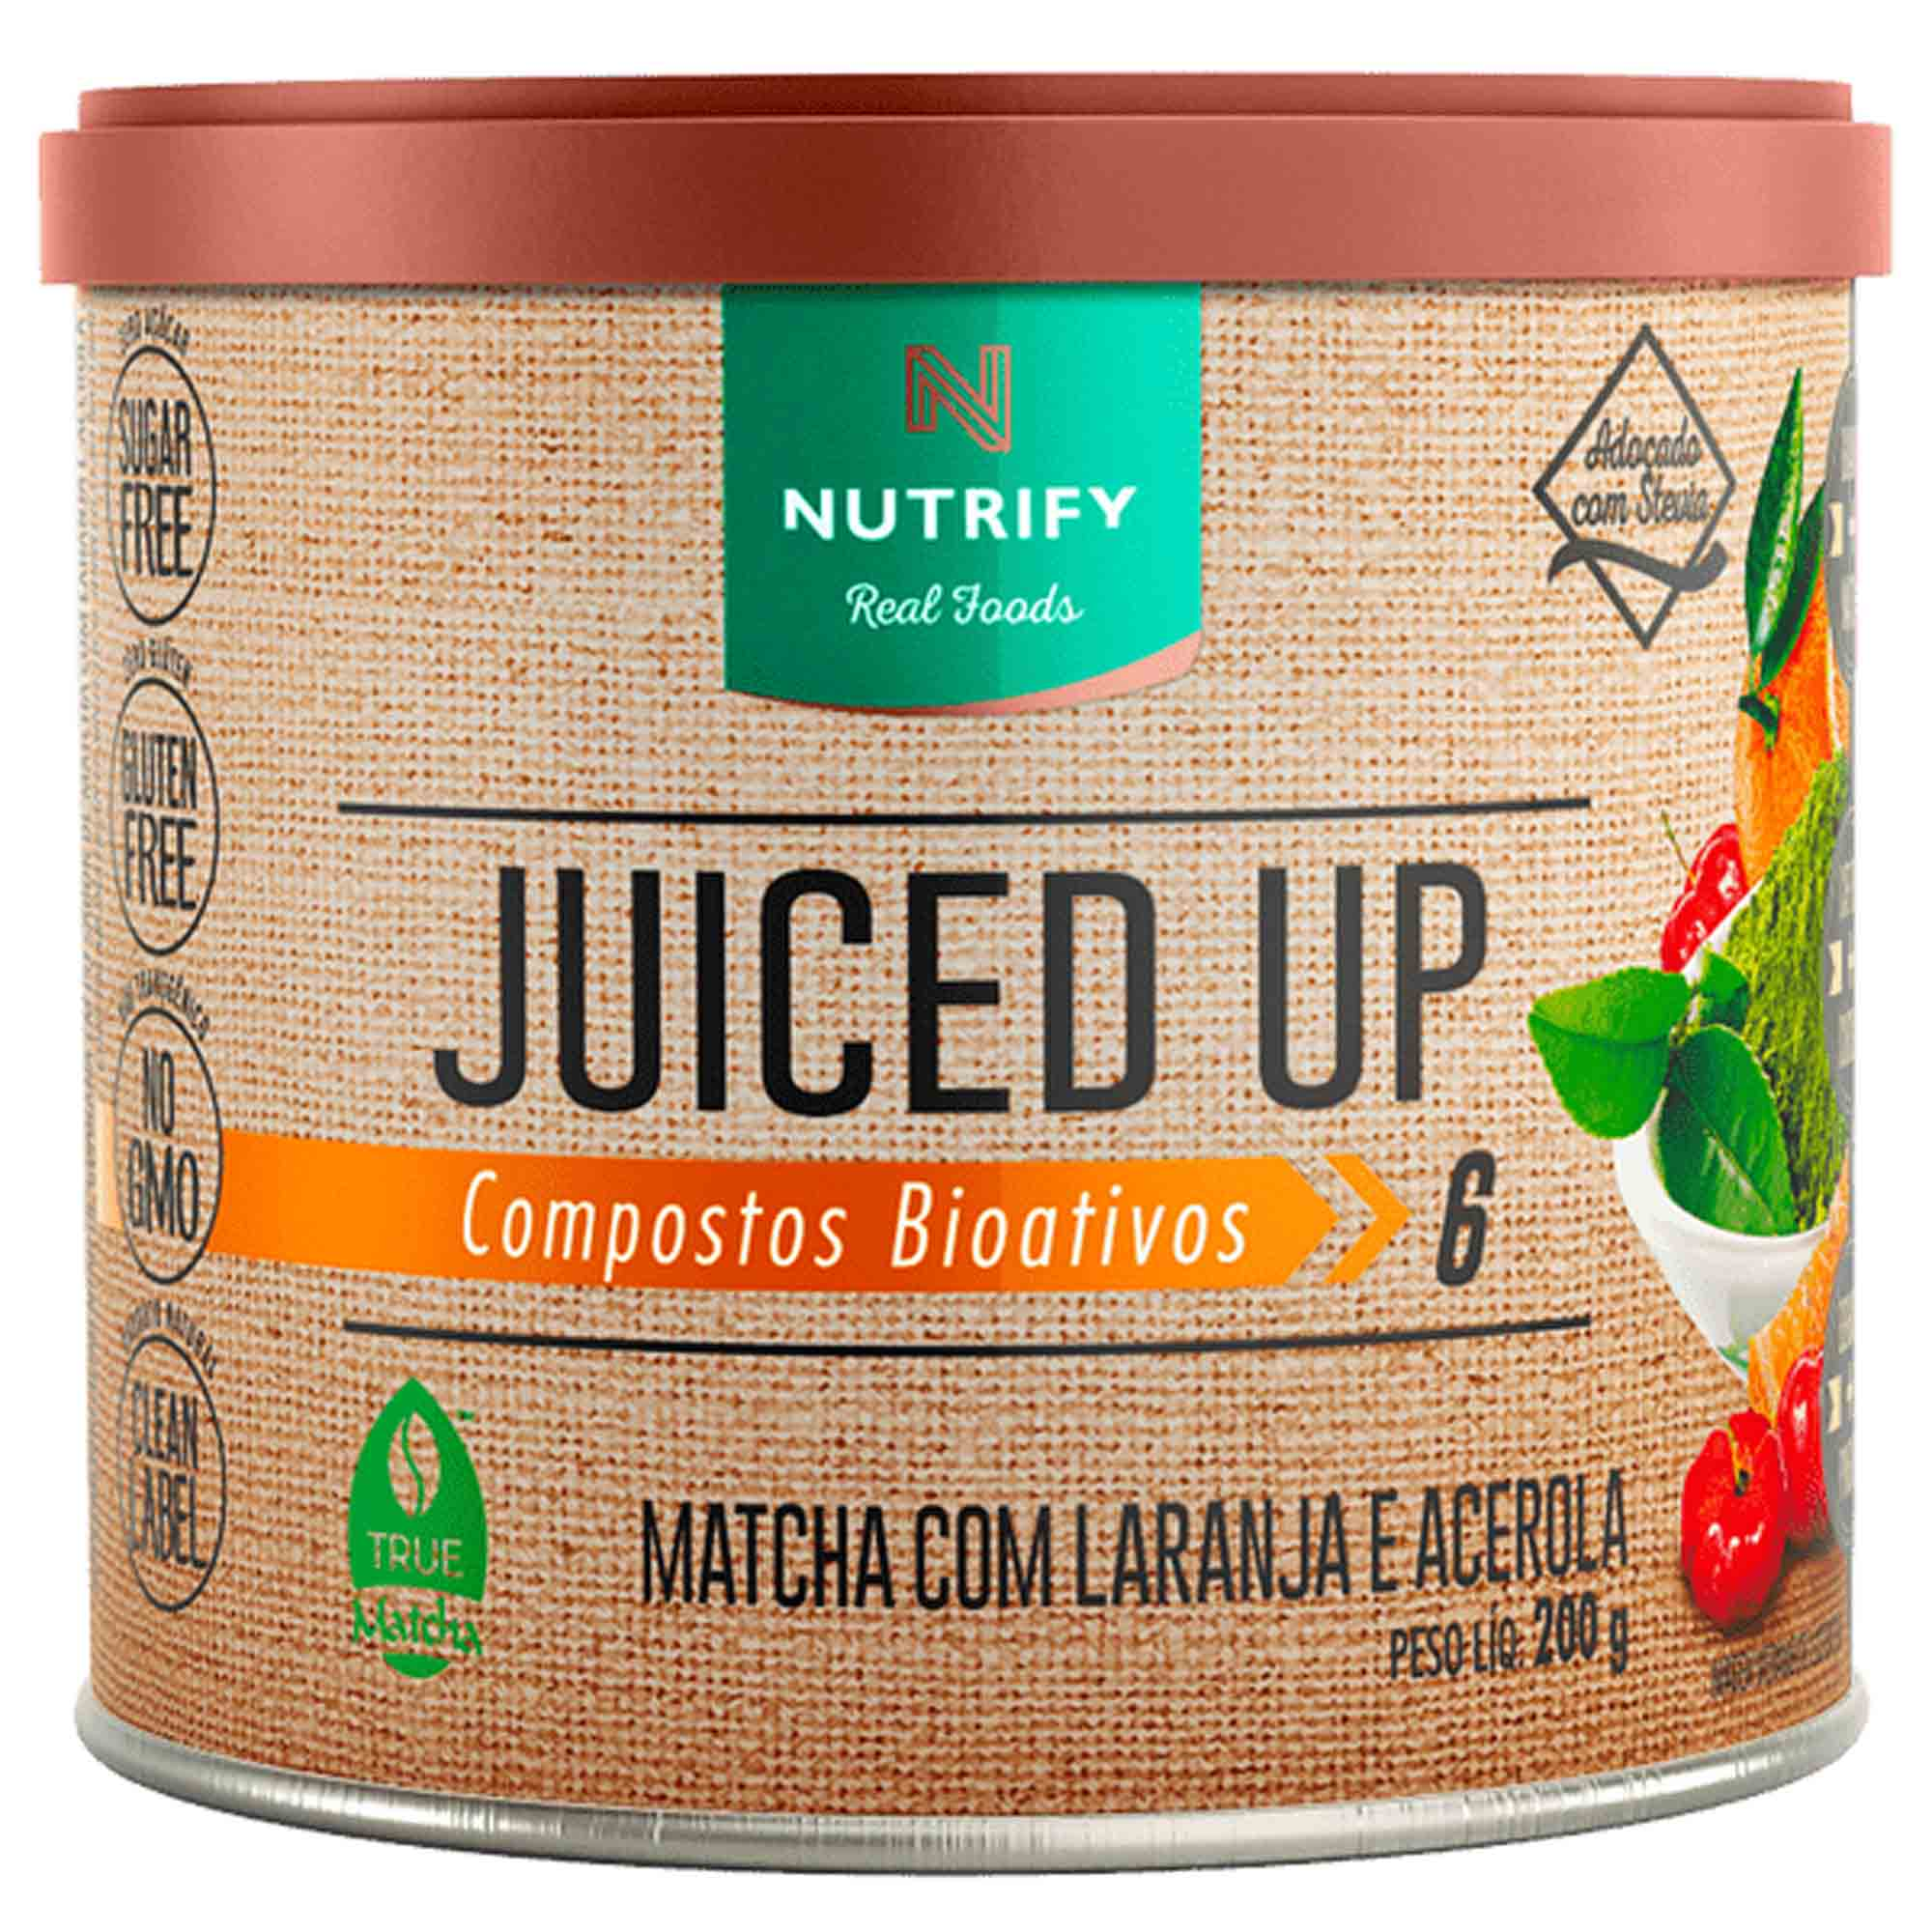 Juiced Up Laranja c/ Acerola 200g Nutrify